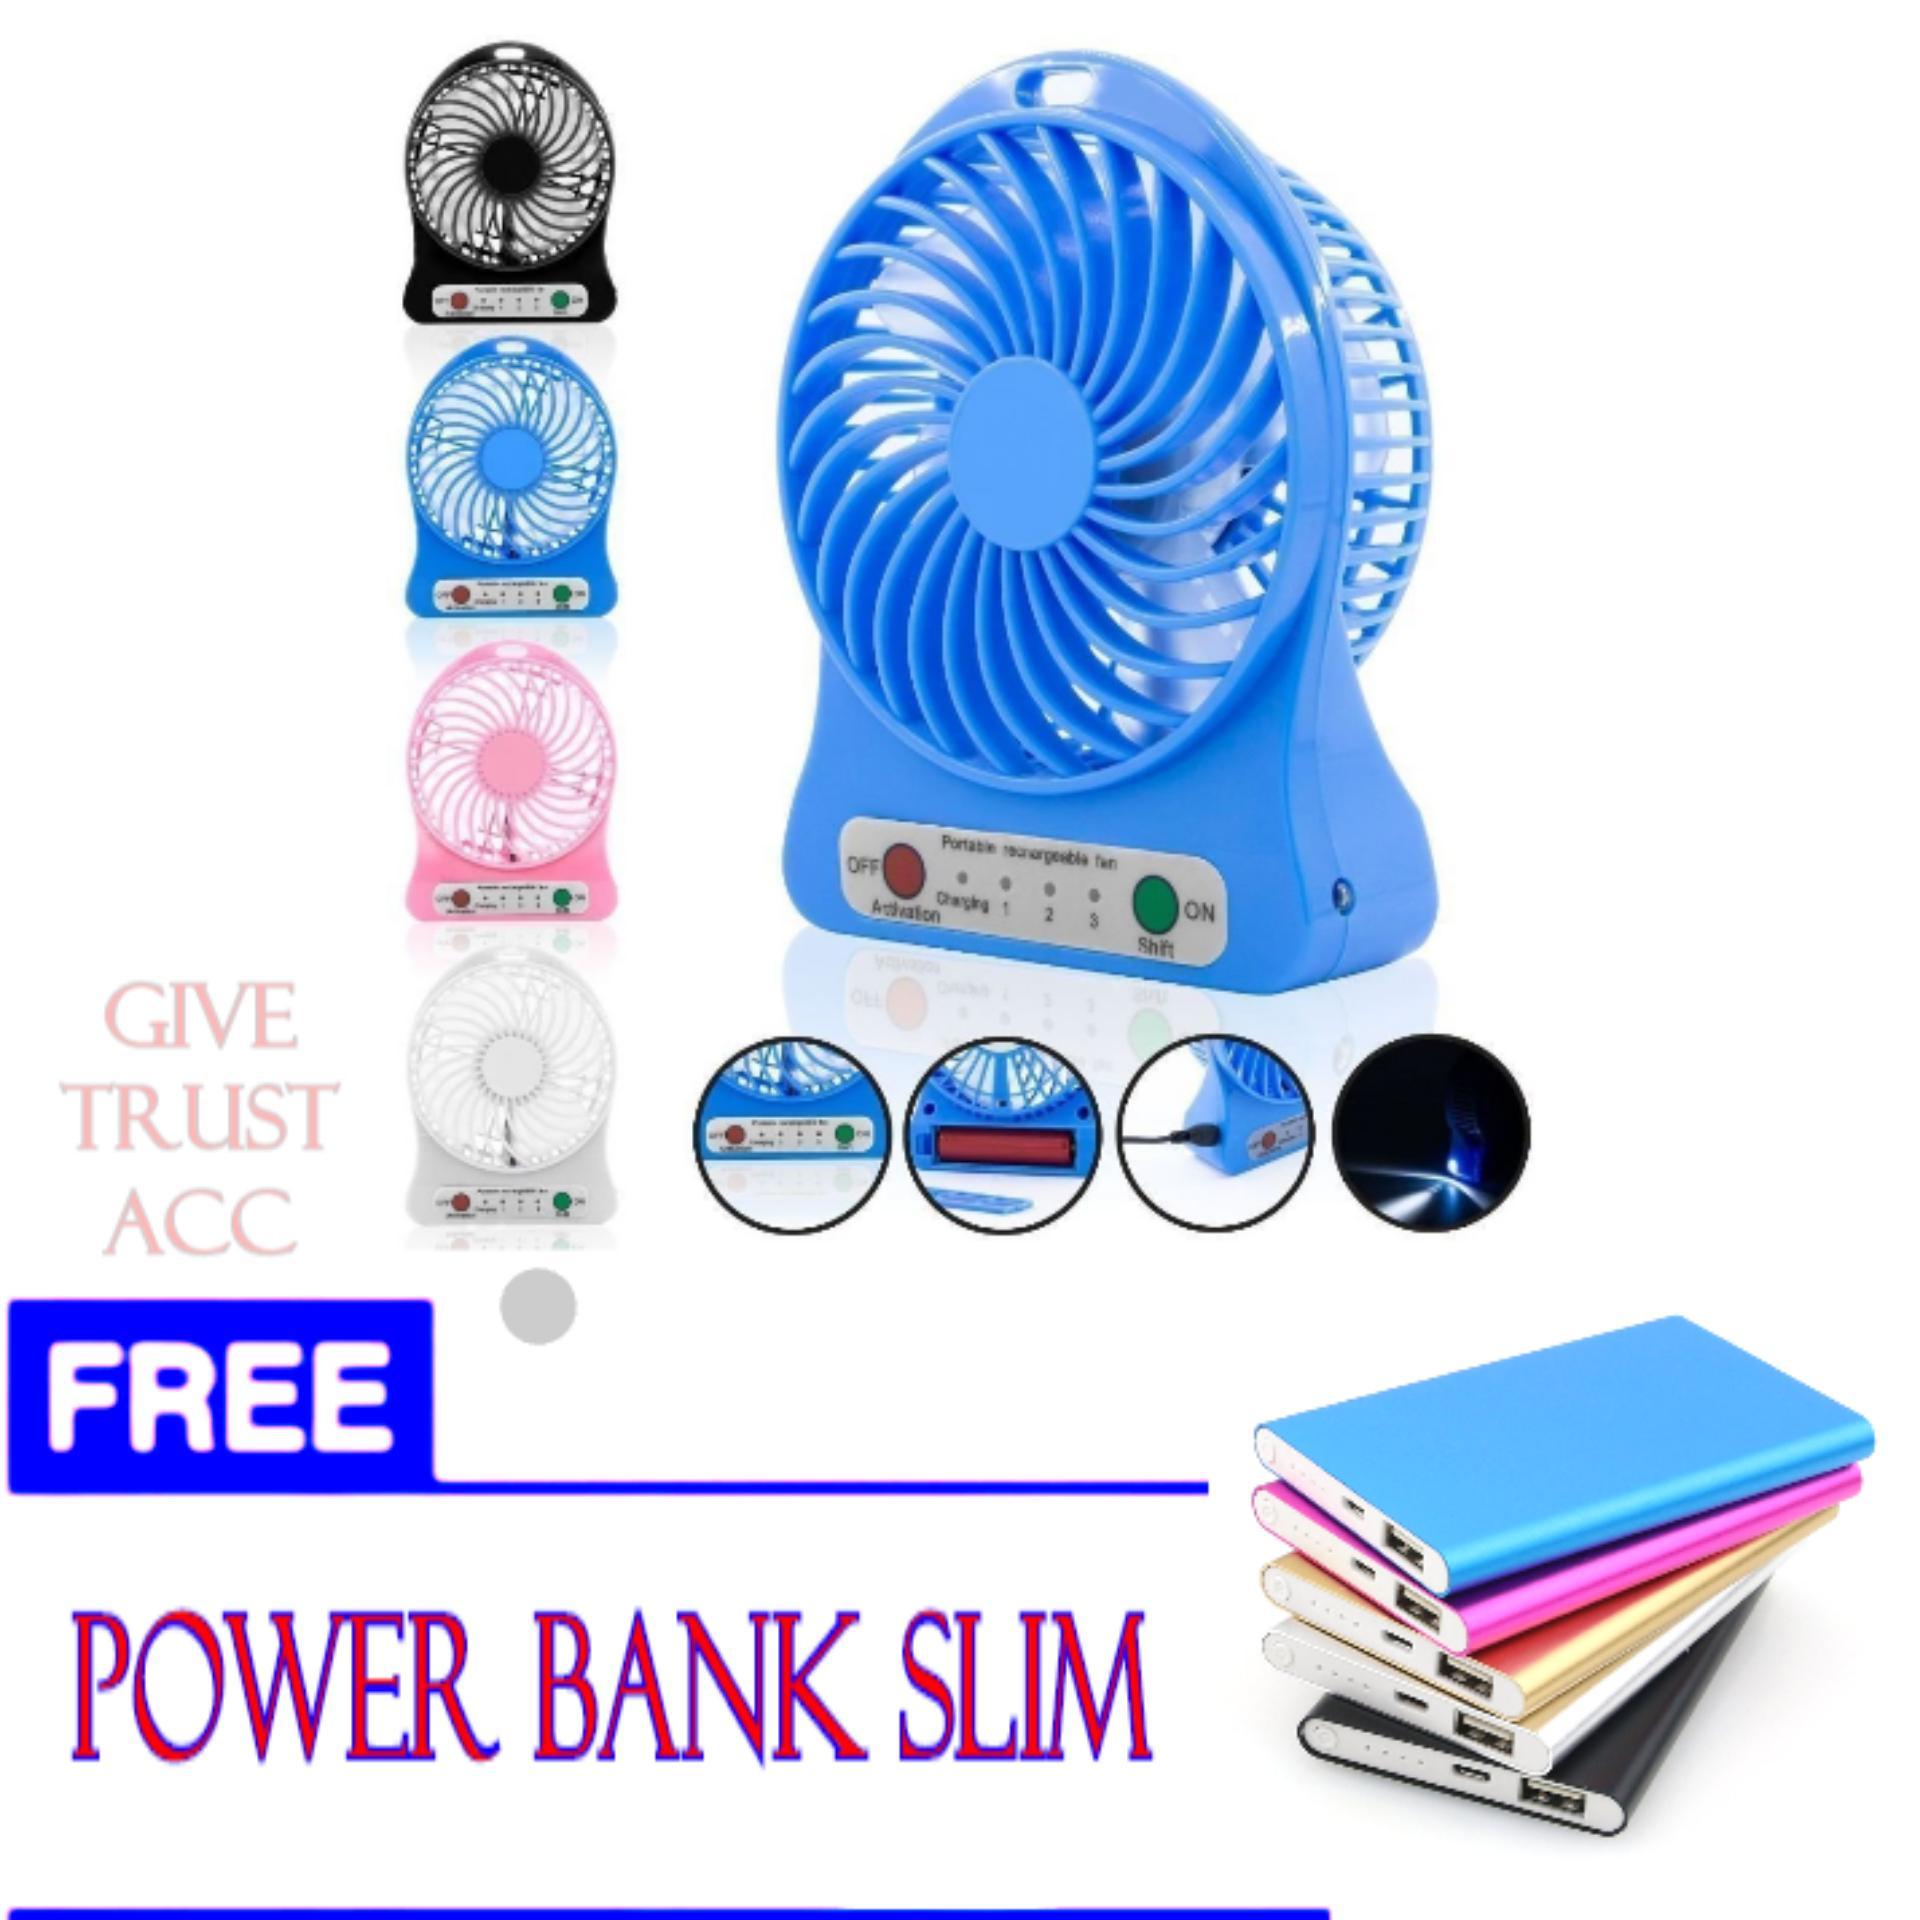 Kipas Angin USB Mini Fan Portable Dengan Baterai Charger + FREE POWER BANK SLIM.